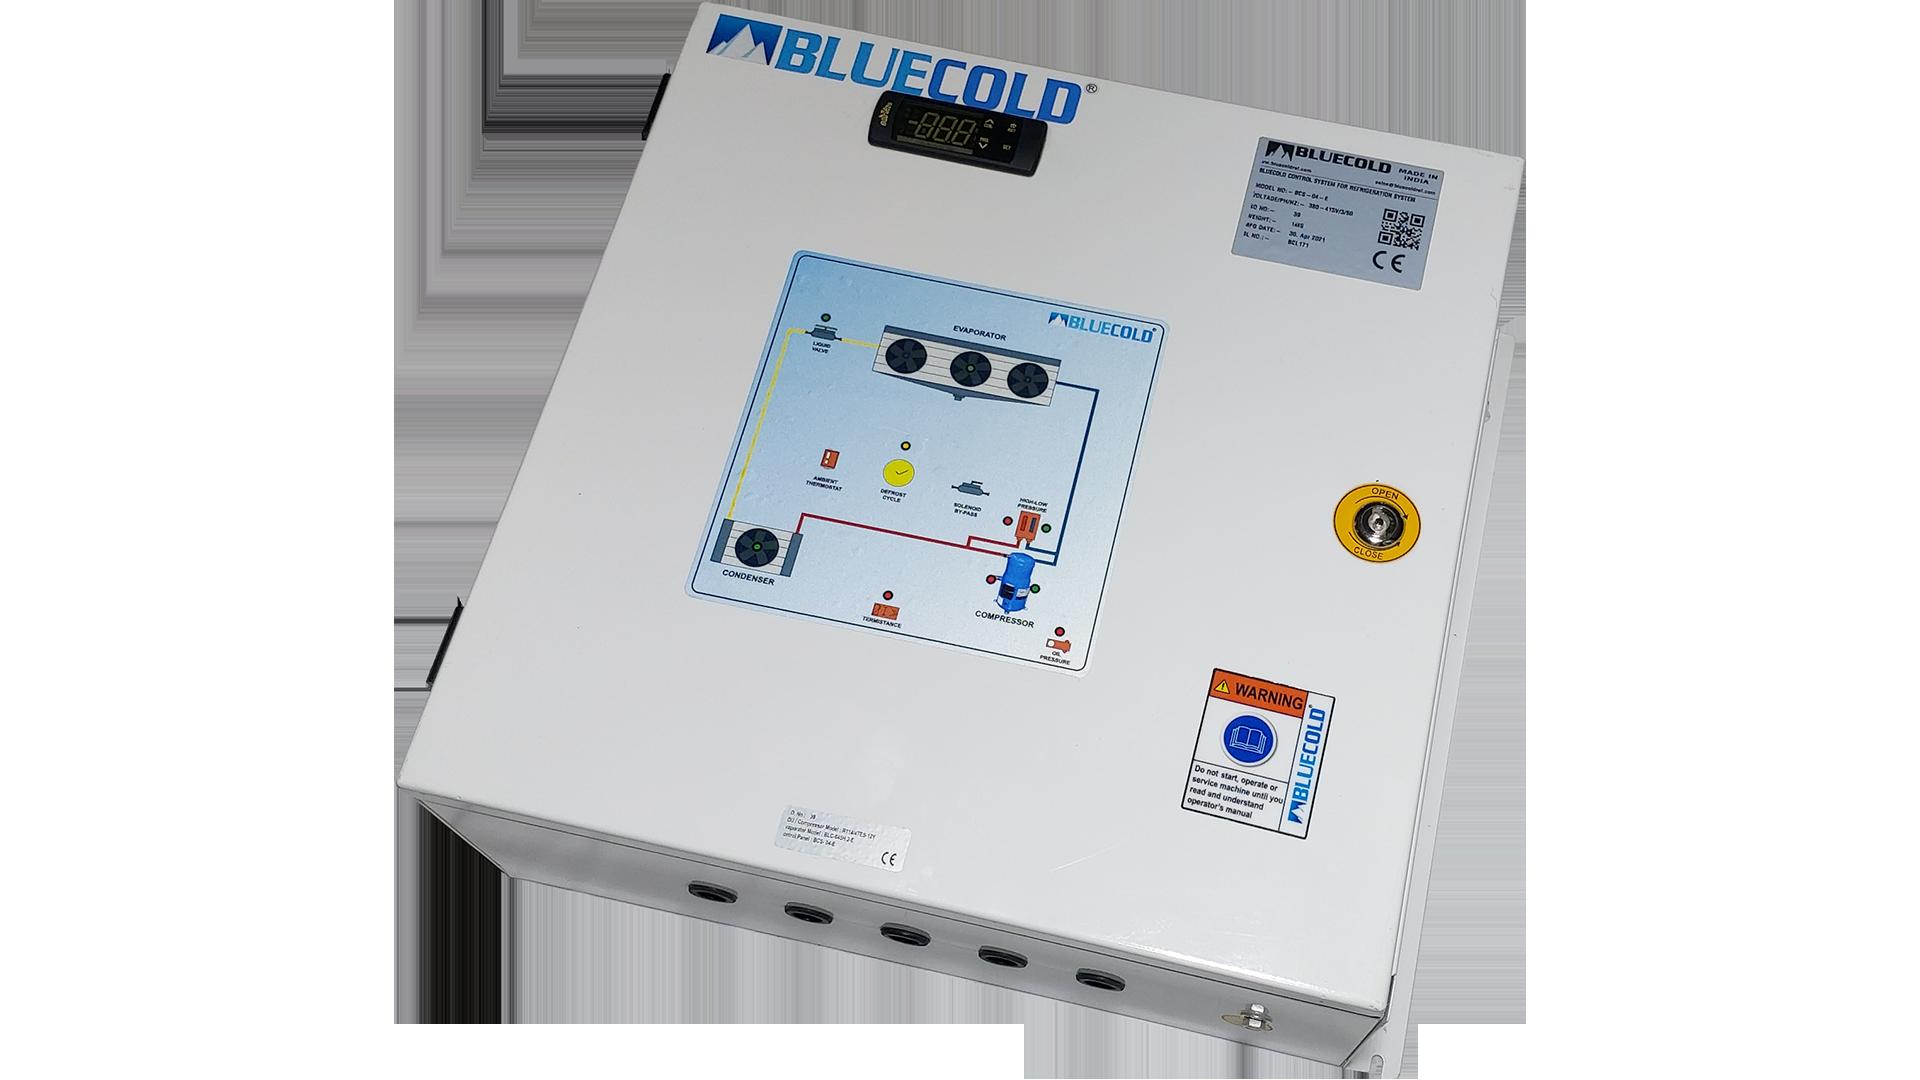 Control panel for danfoss condensing unit